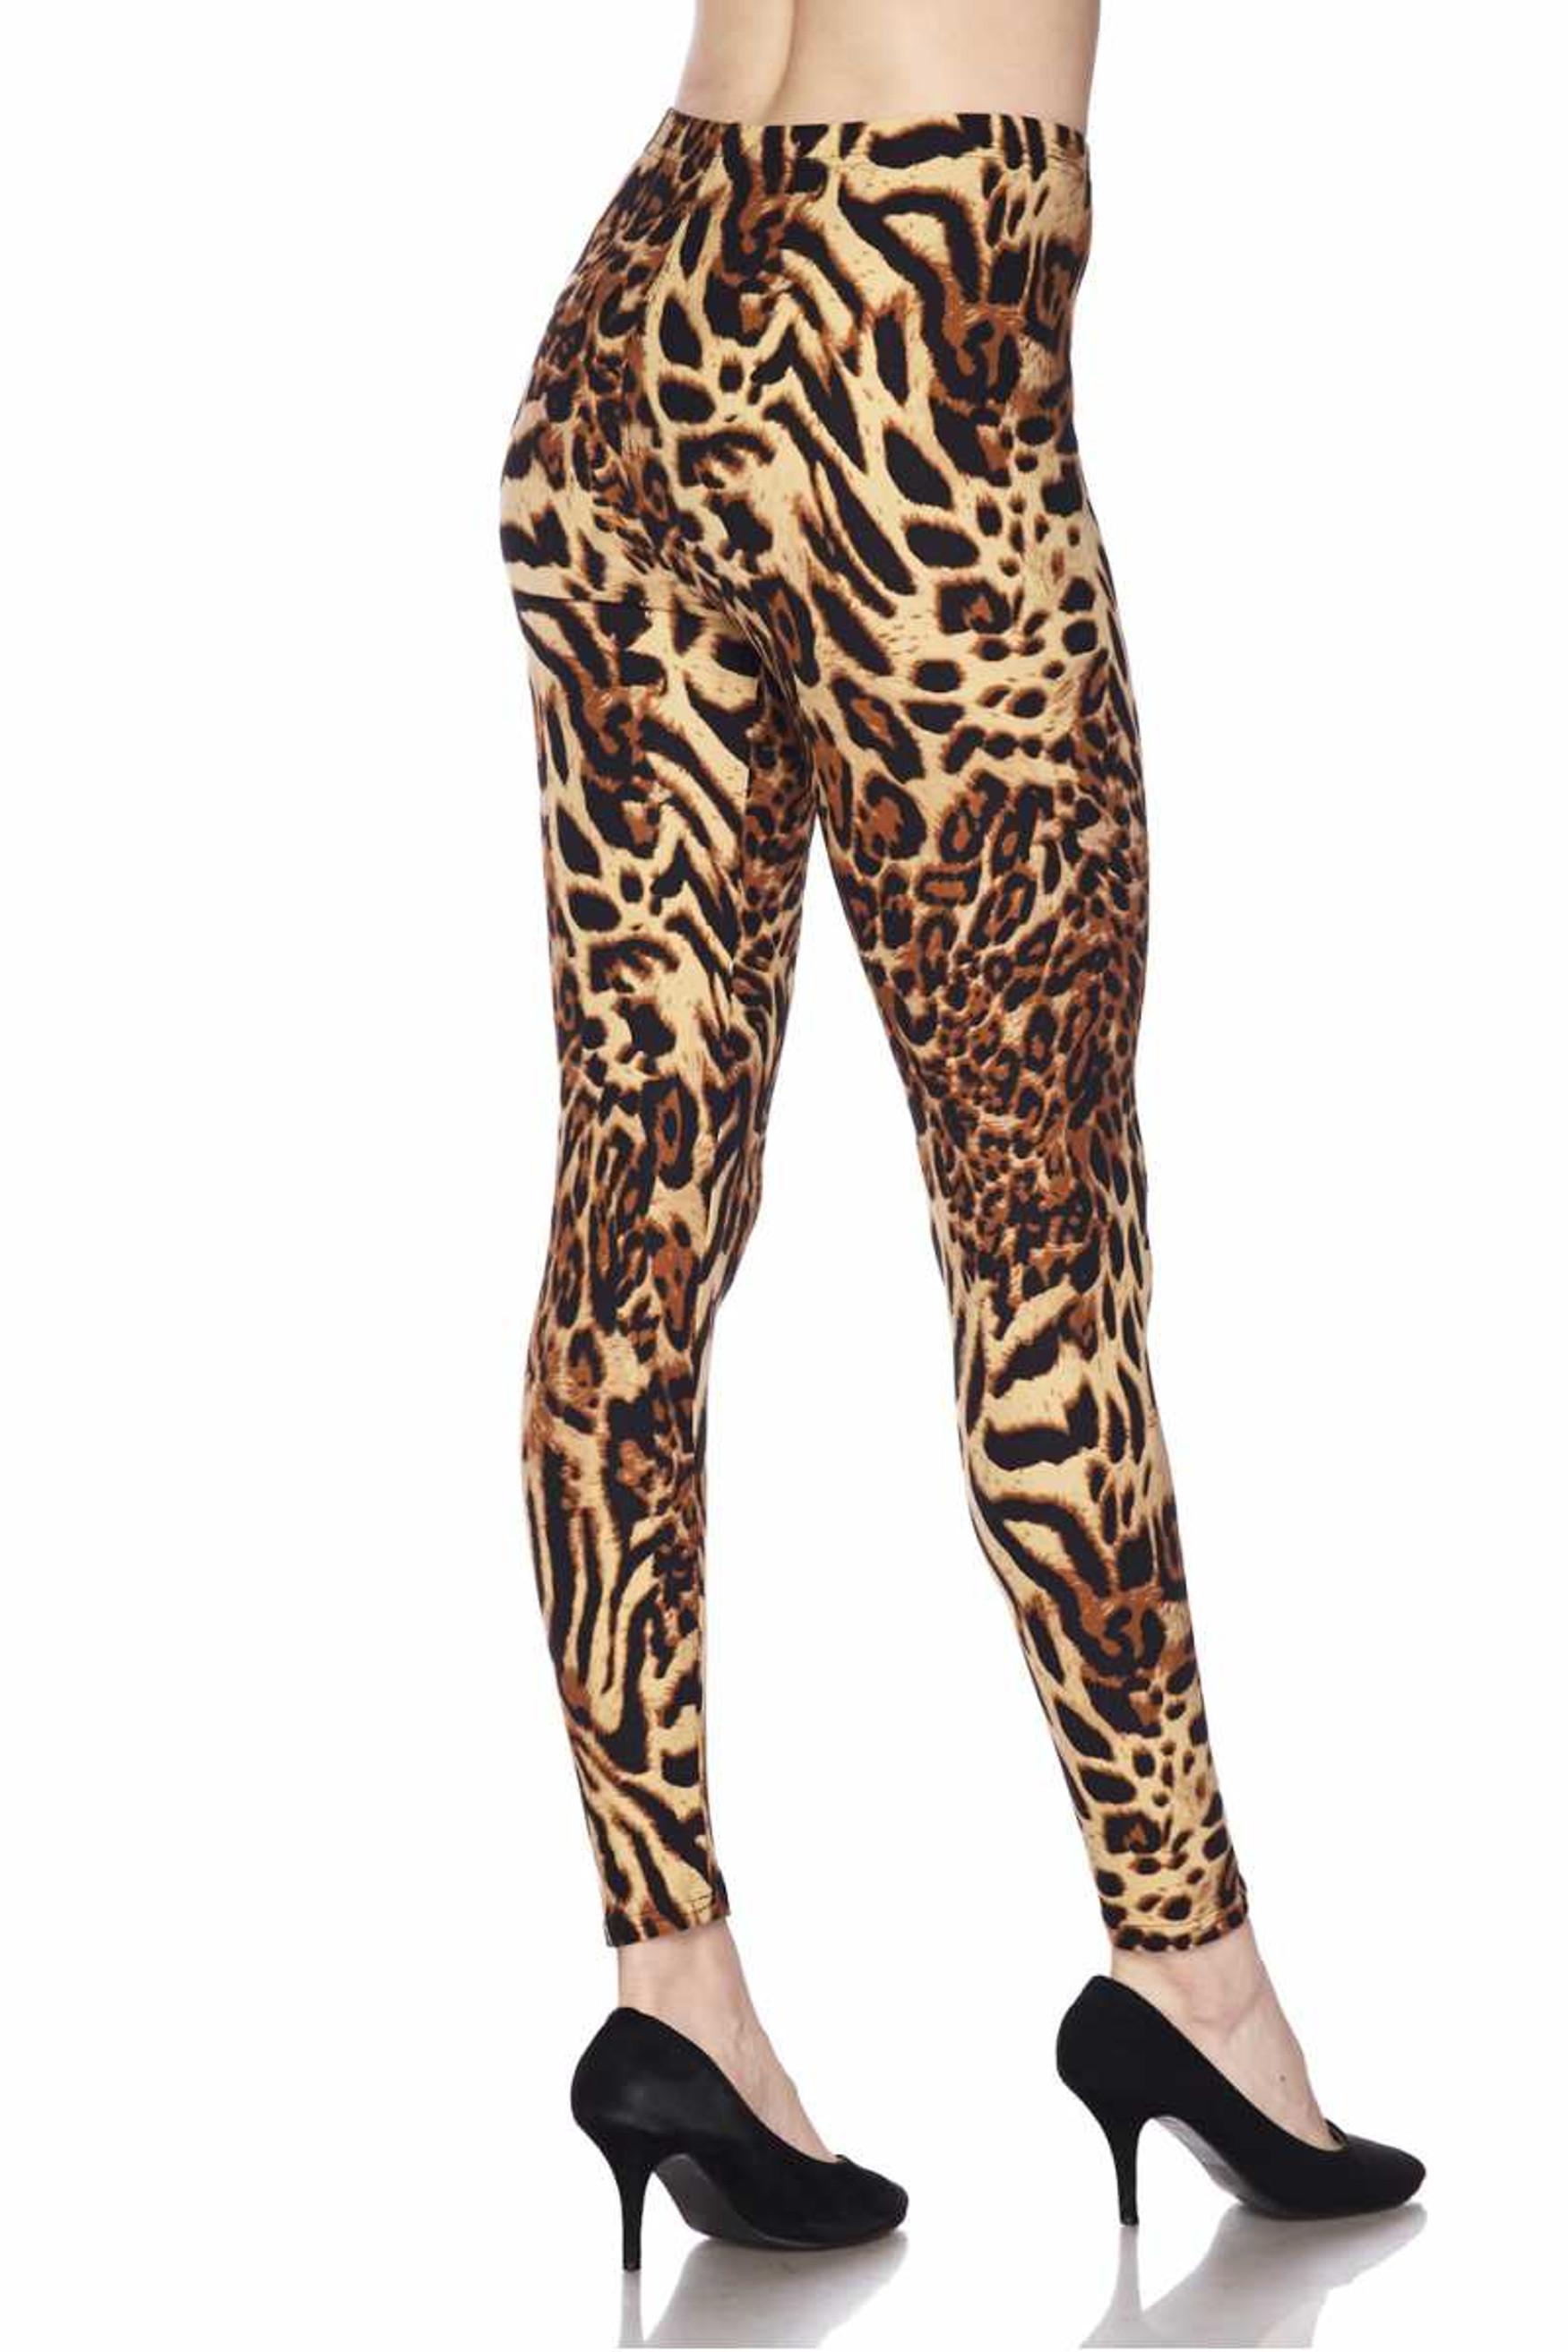 Soft Brushed Predator Leopard Leggings